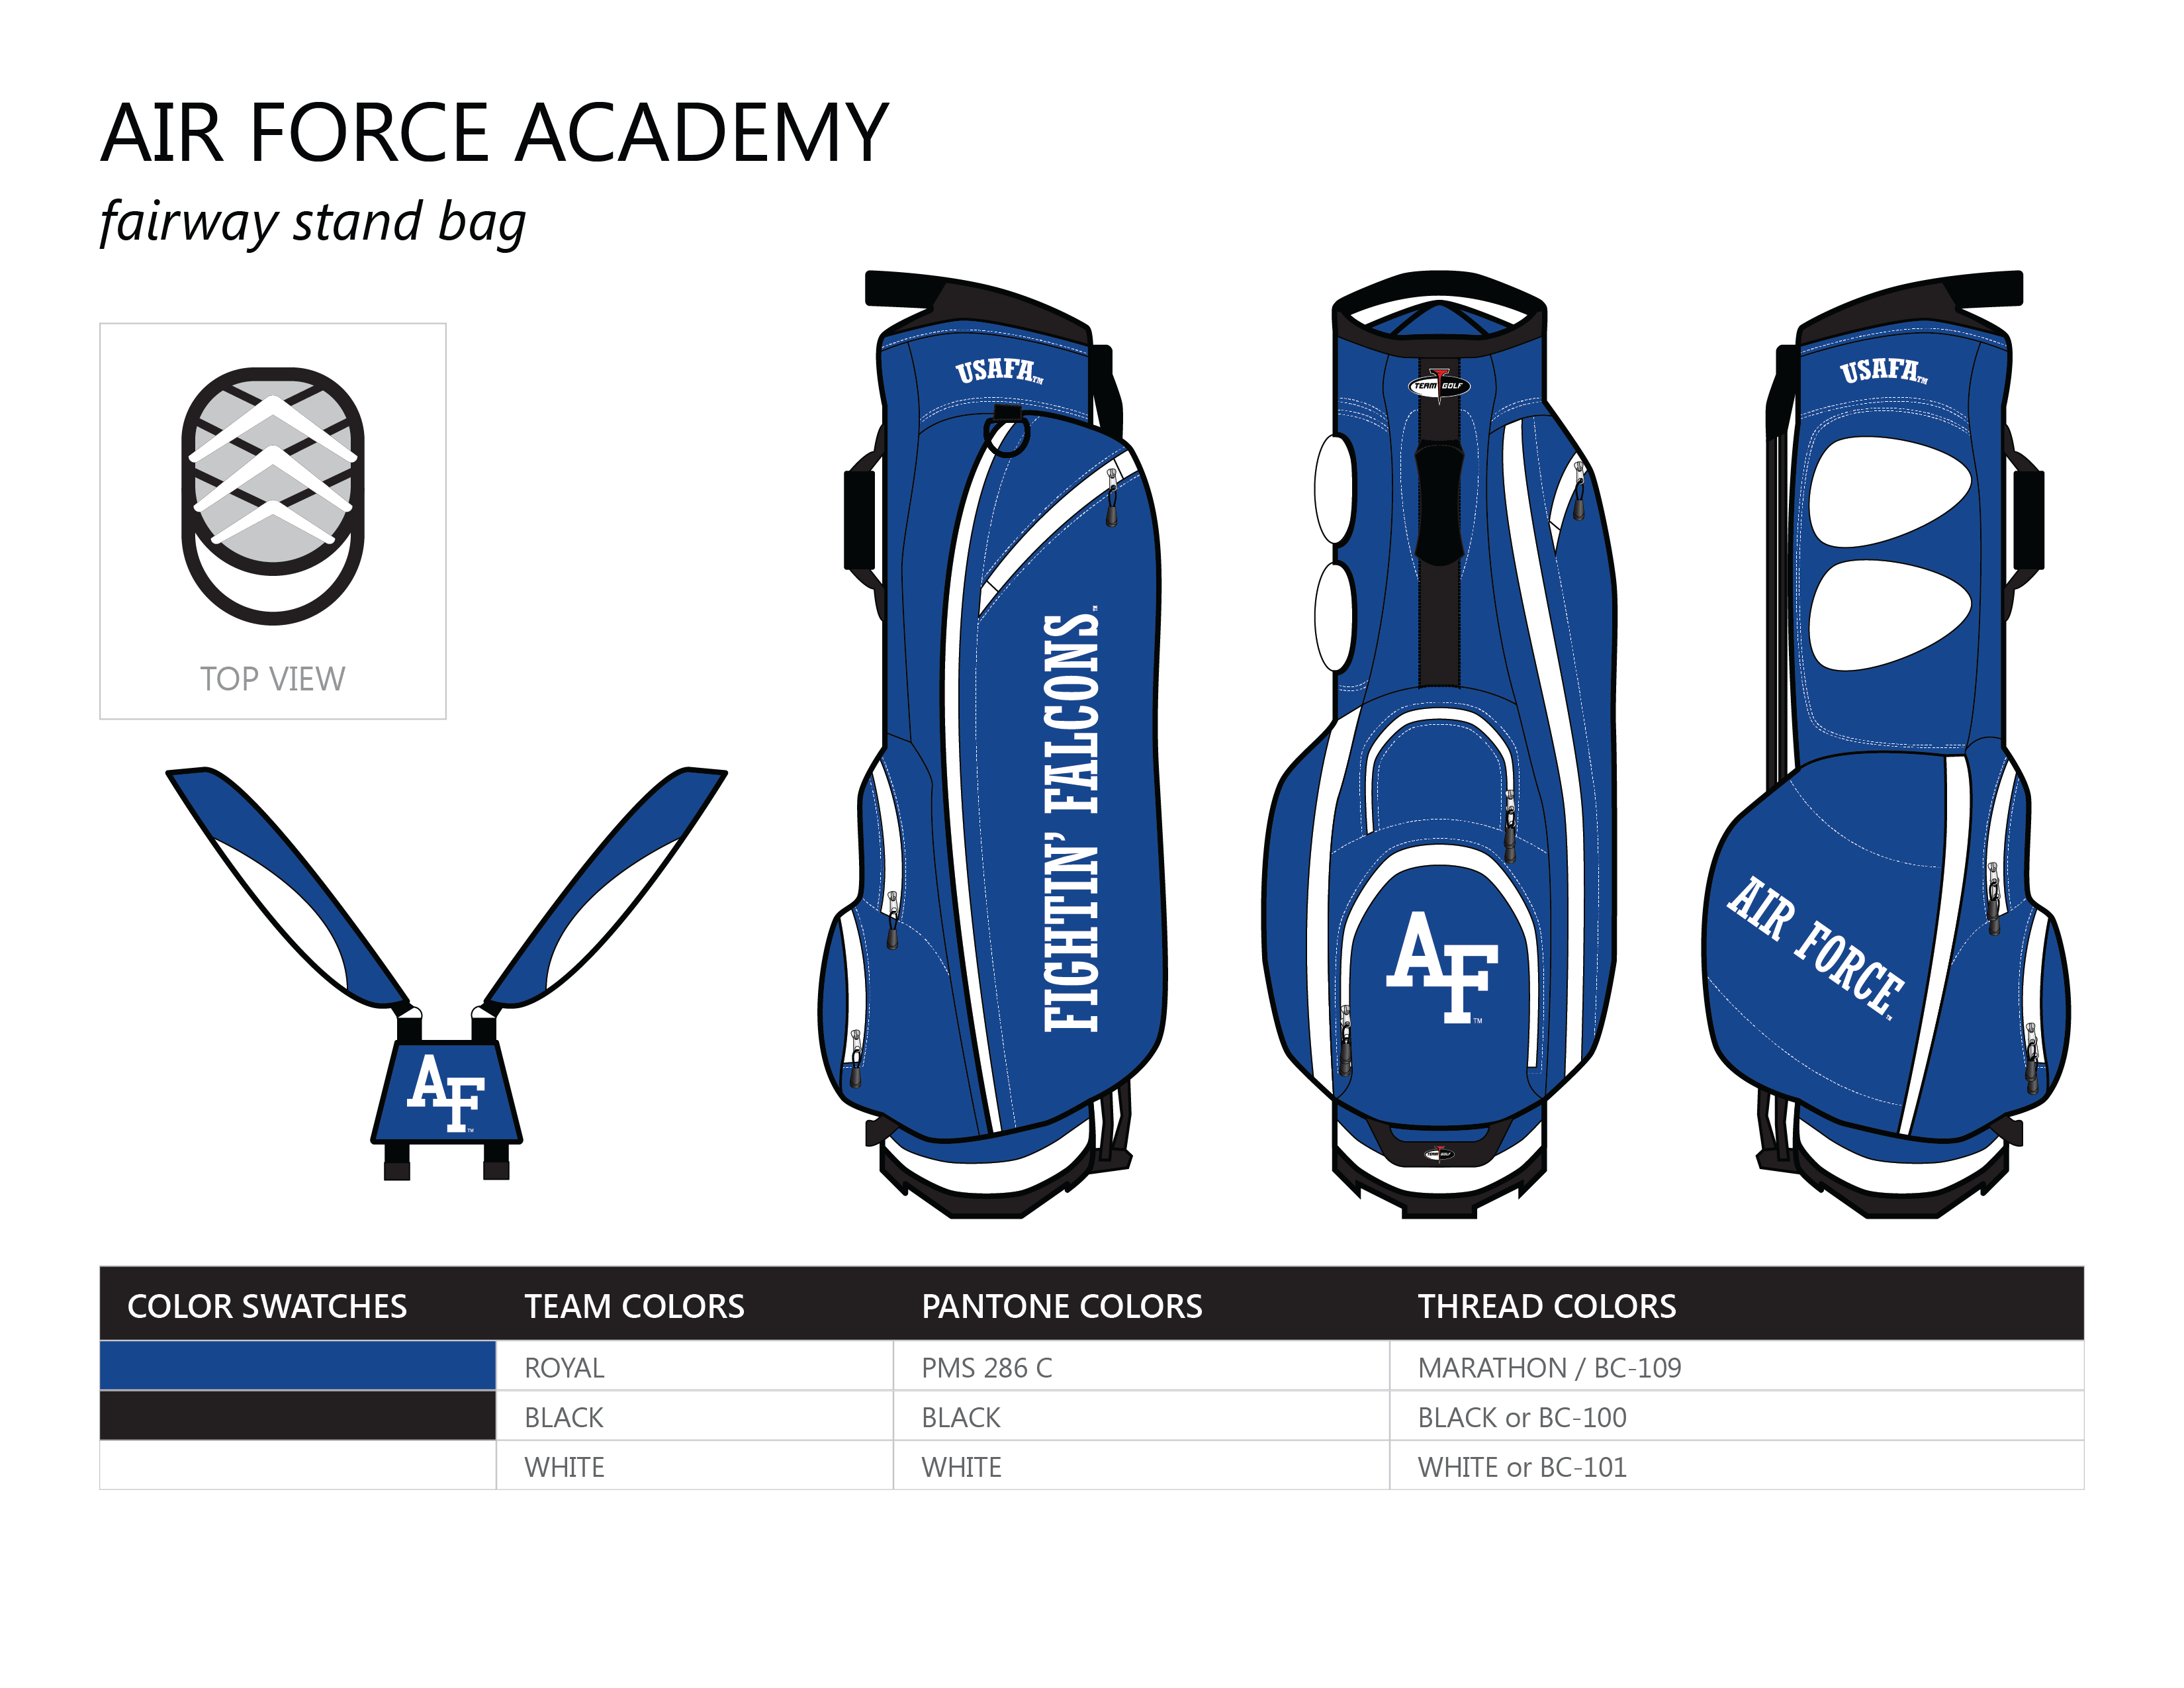 USAFA Fairway Golf Bag